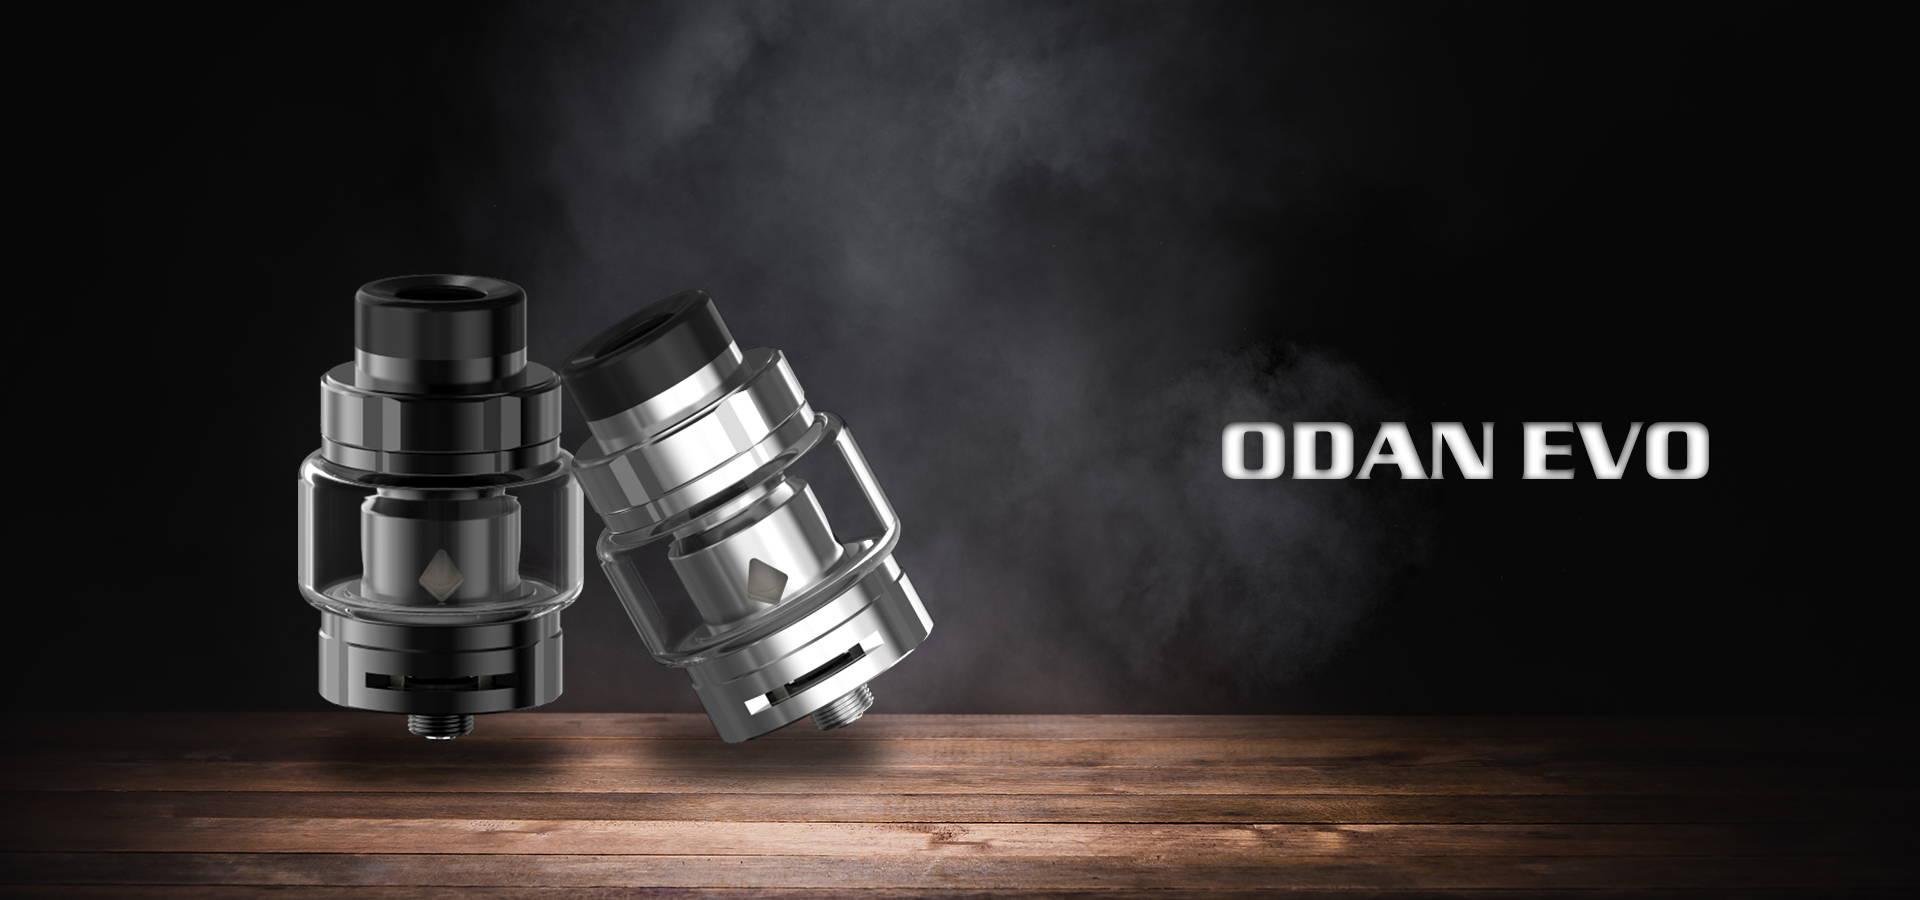 Aspire Odan EVO Sub Ohm Tank - UK Aspire Vendor